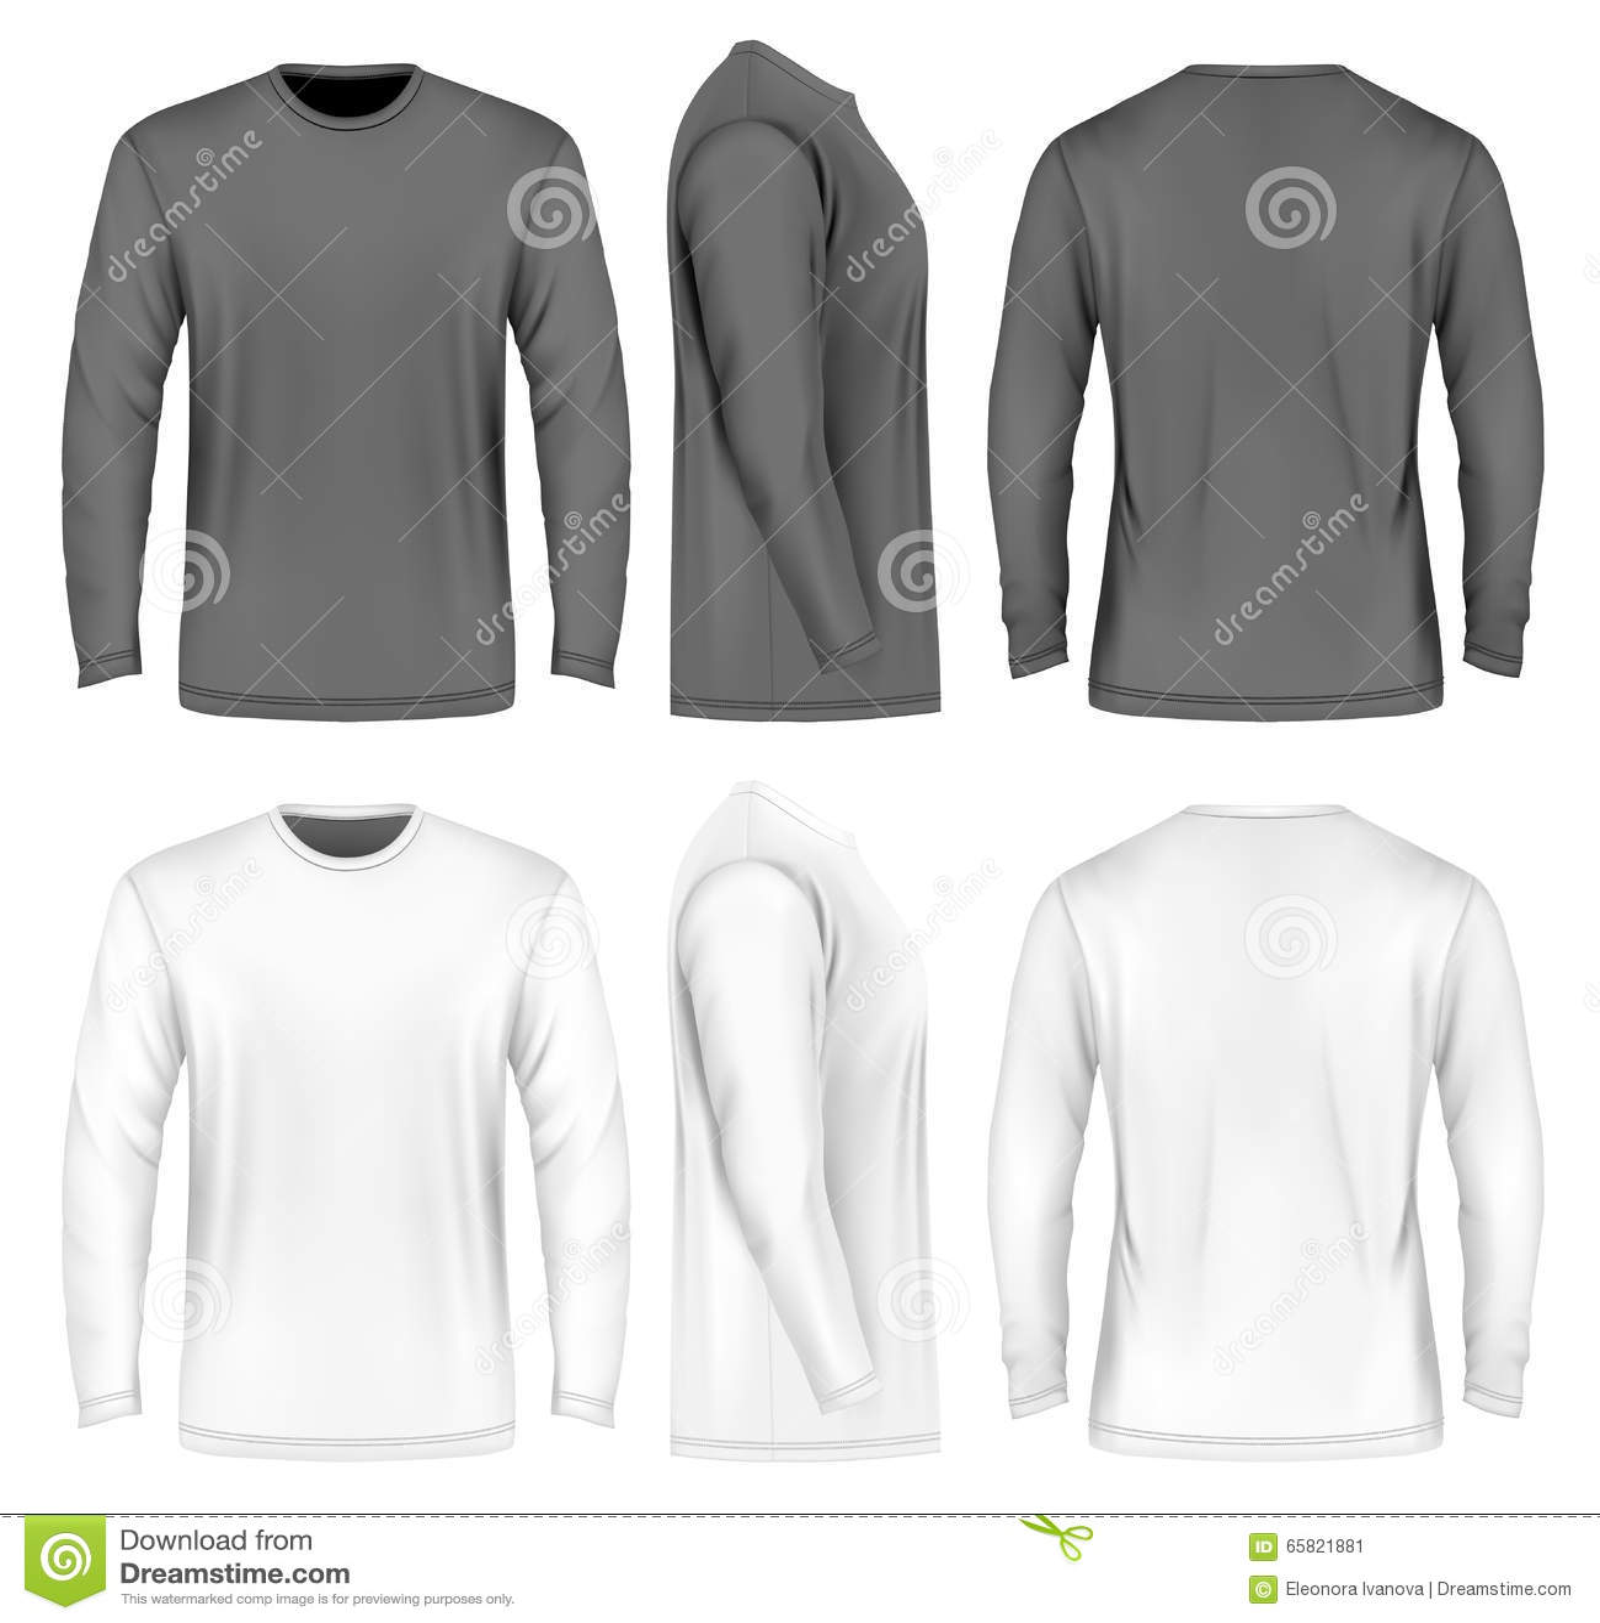 5bcc69a49df948 Langärmliges T-Shirt Der Männer Vektor Abbildung - Illustration von ...